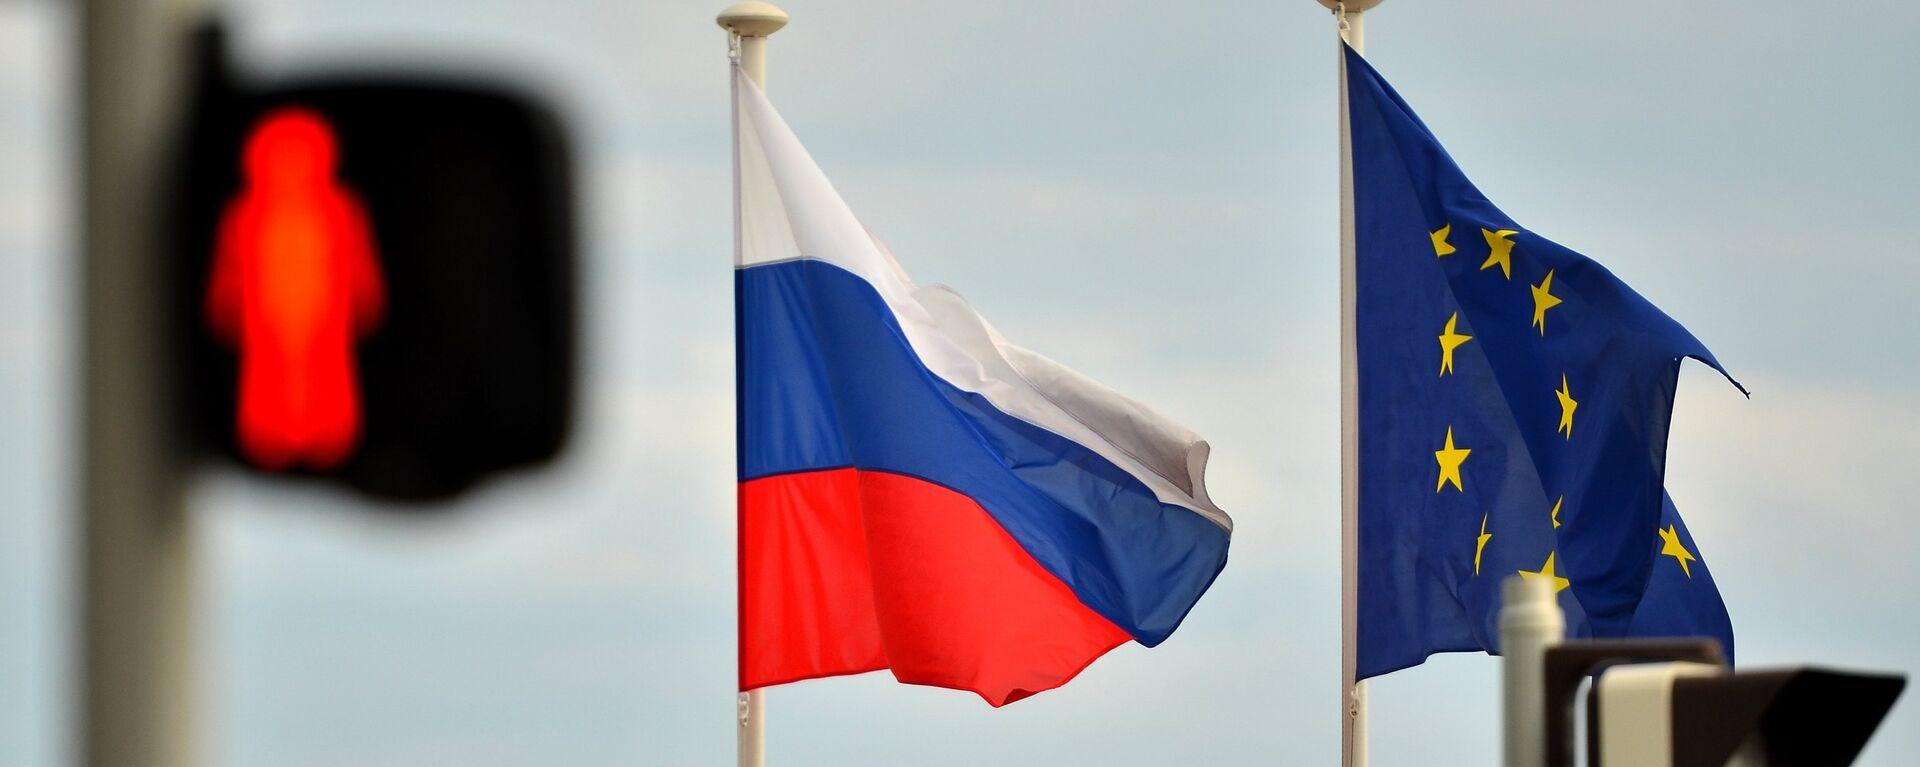 Bandiere di Russia e UE - Sputnik Italia, 1920, 25.06.2021